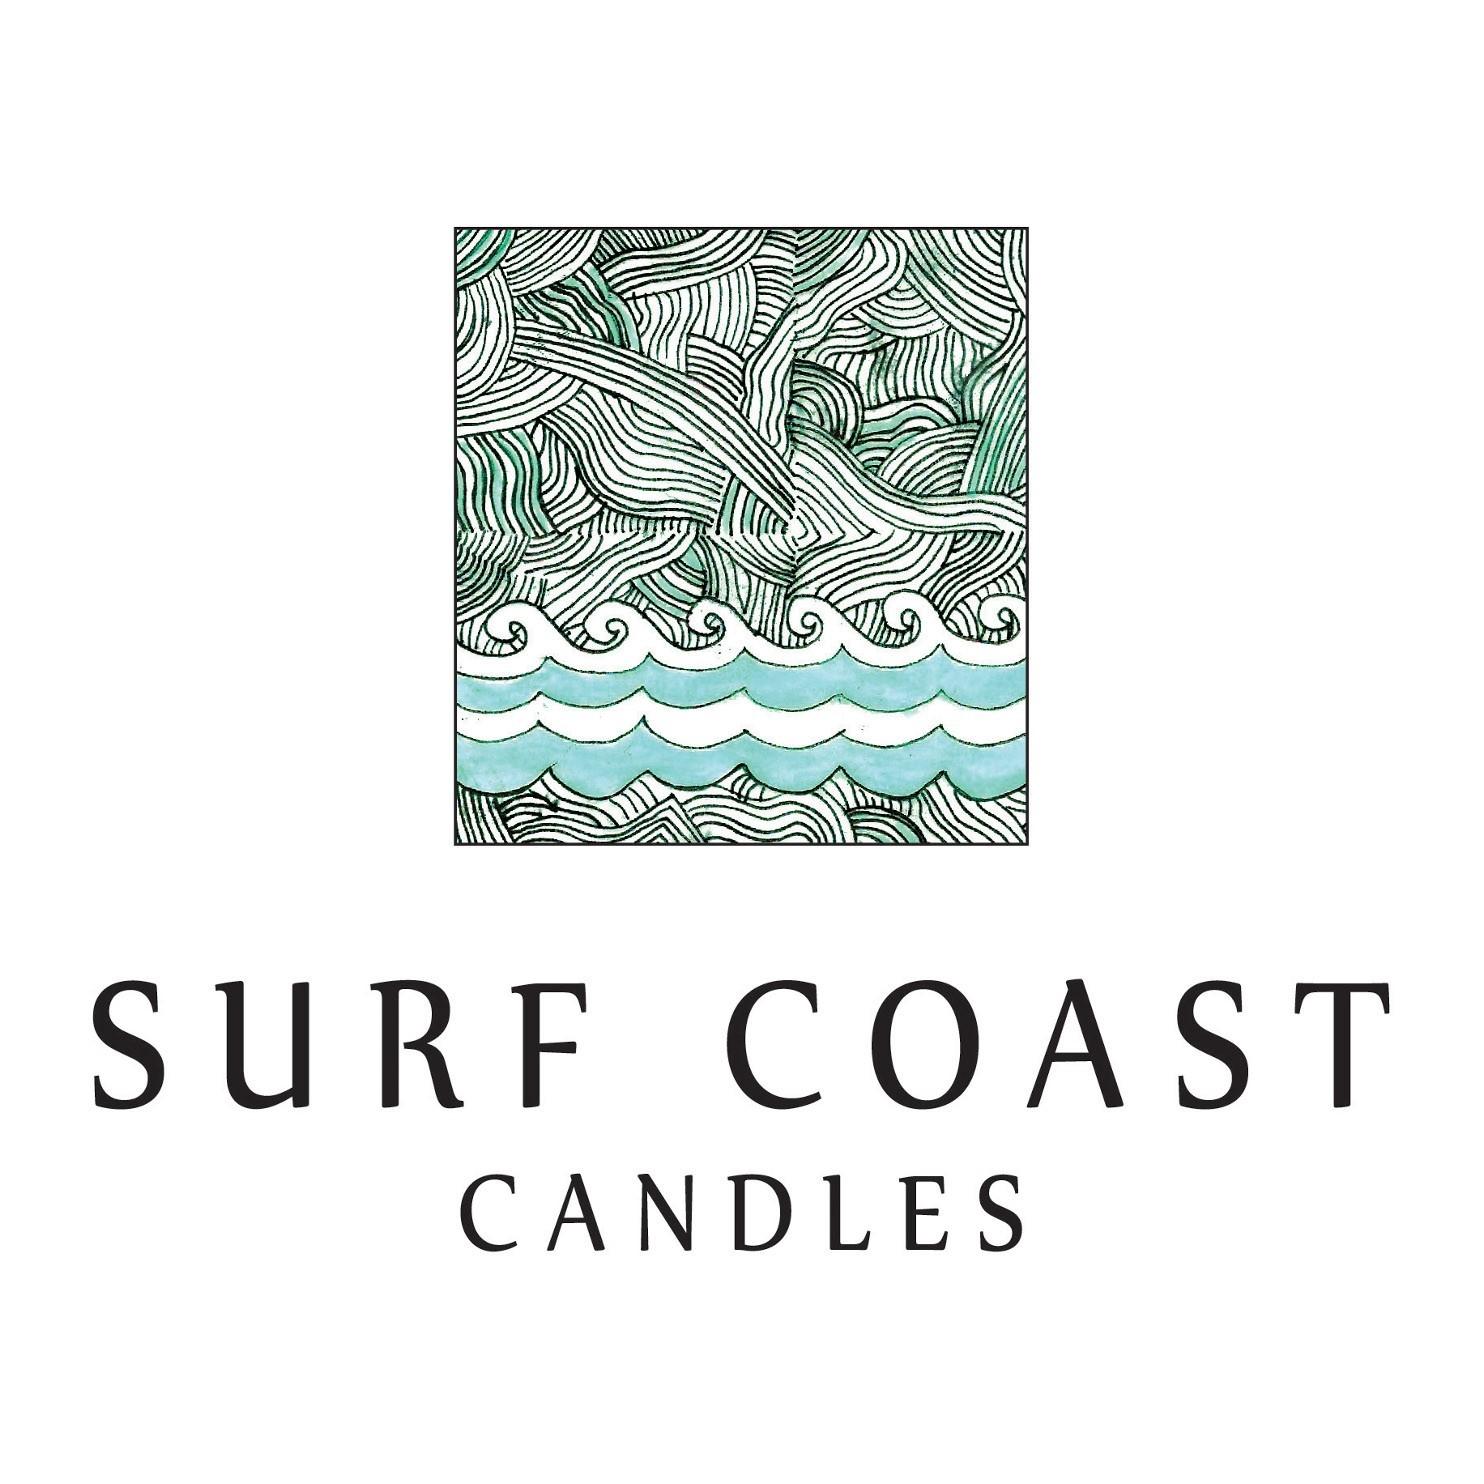 Surf Coast Candles